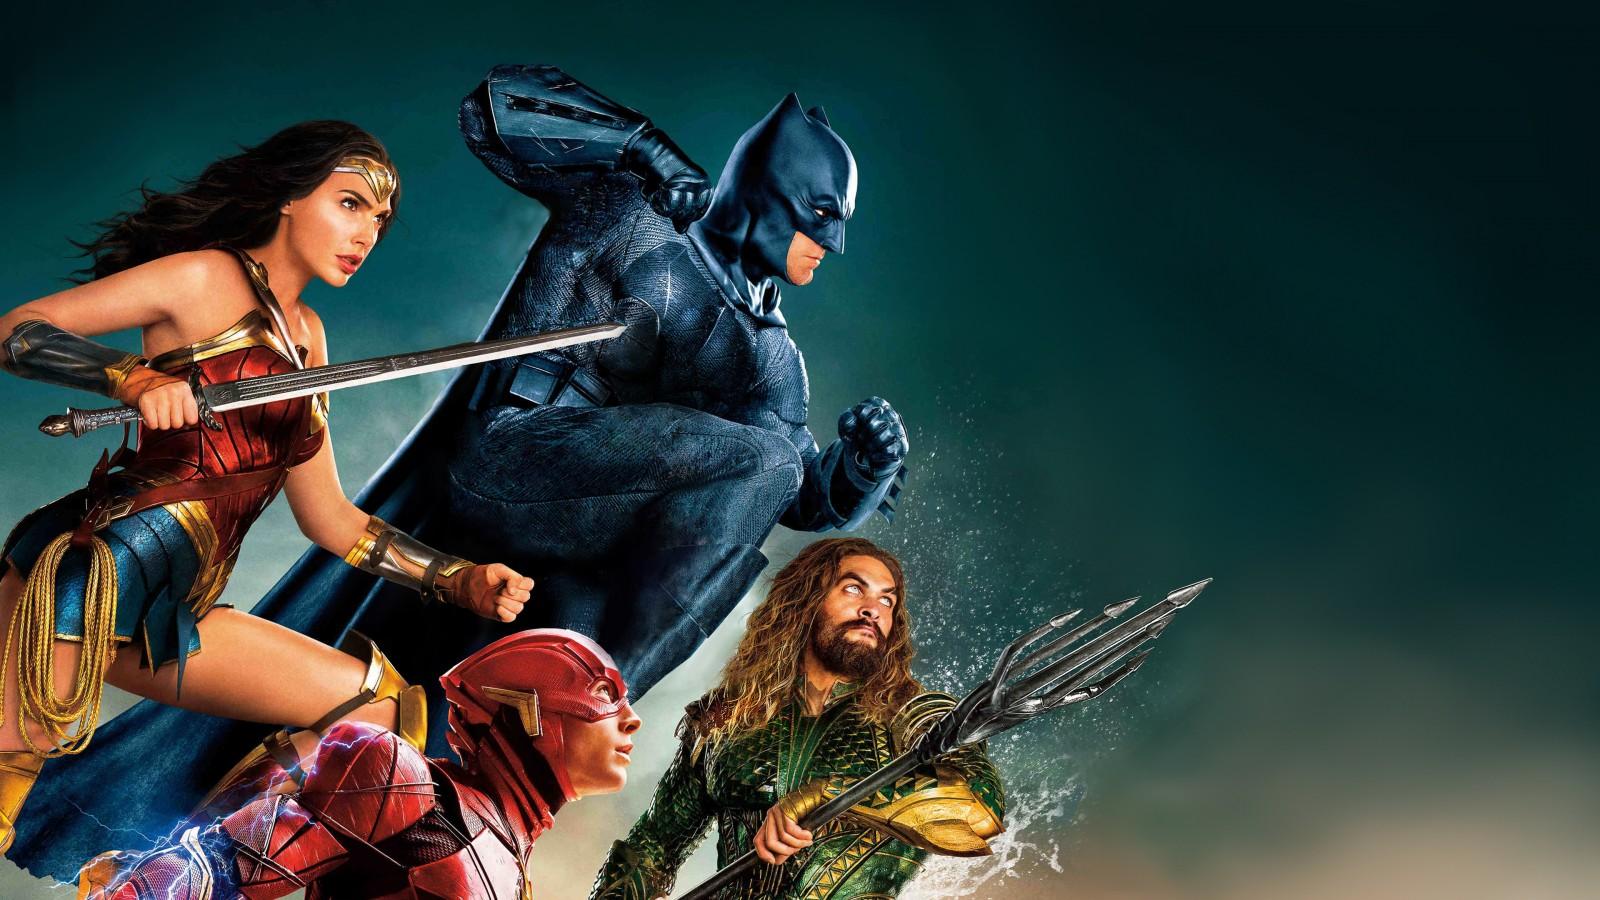 4k Wallpaper Cute League Justice League Superheroes 4k Wallpapers Hd Wallpapers